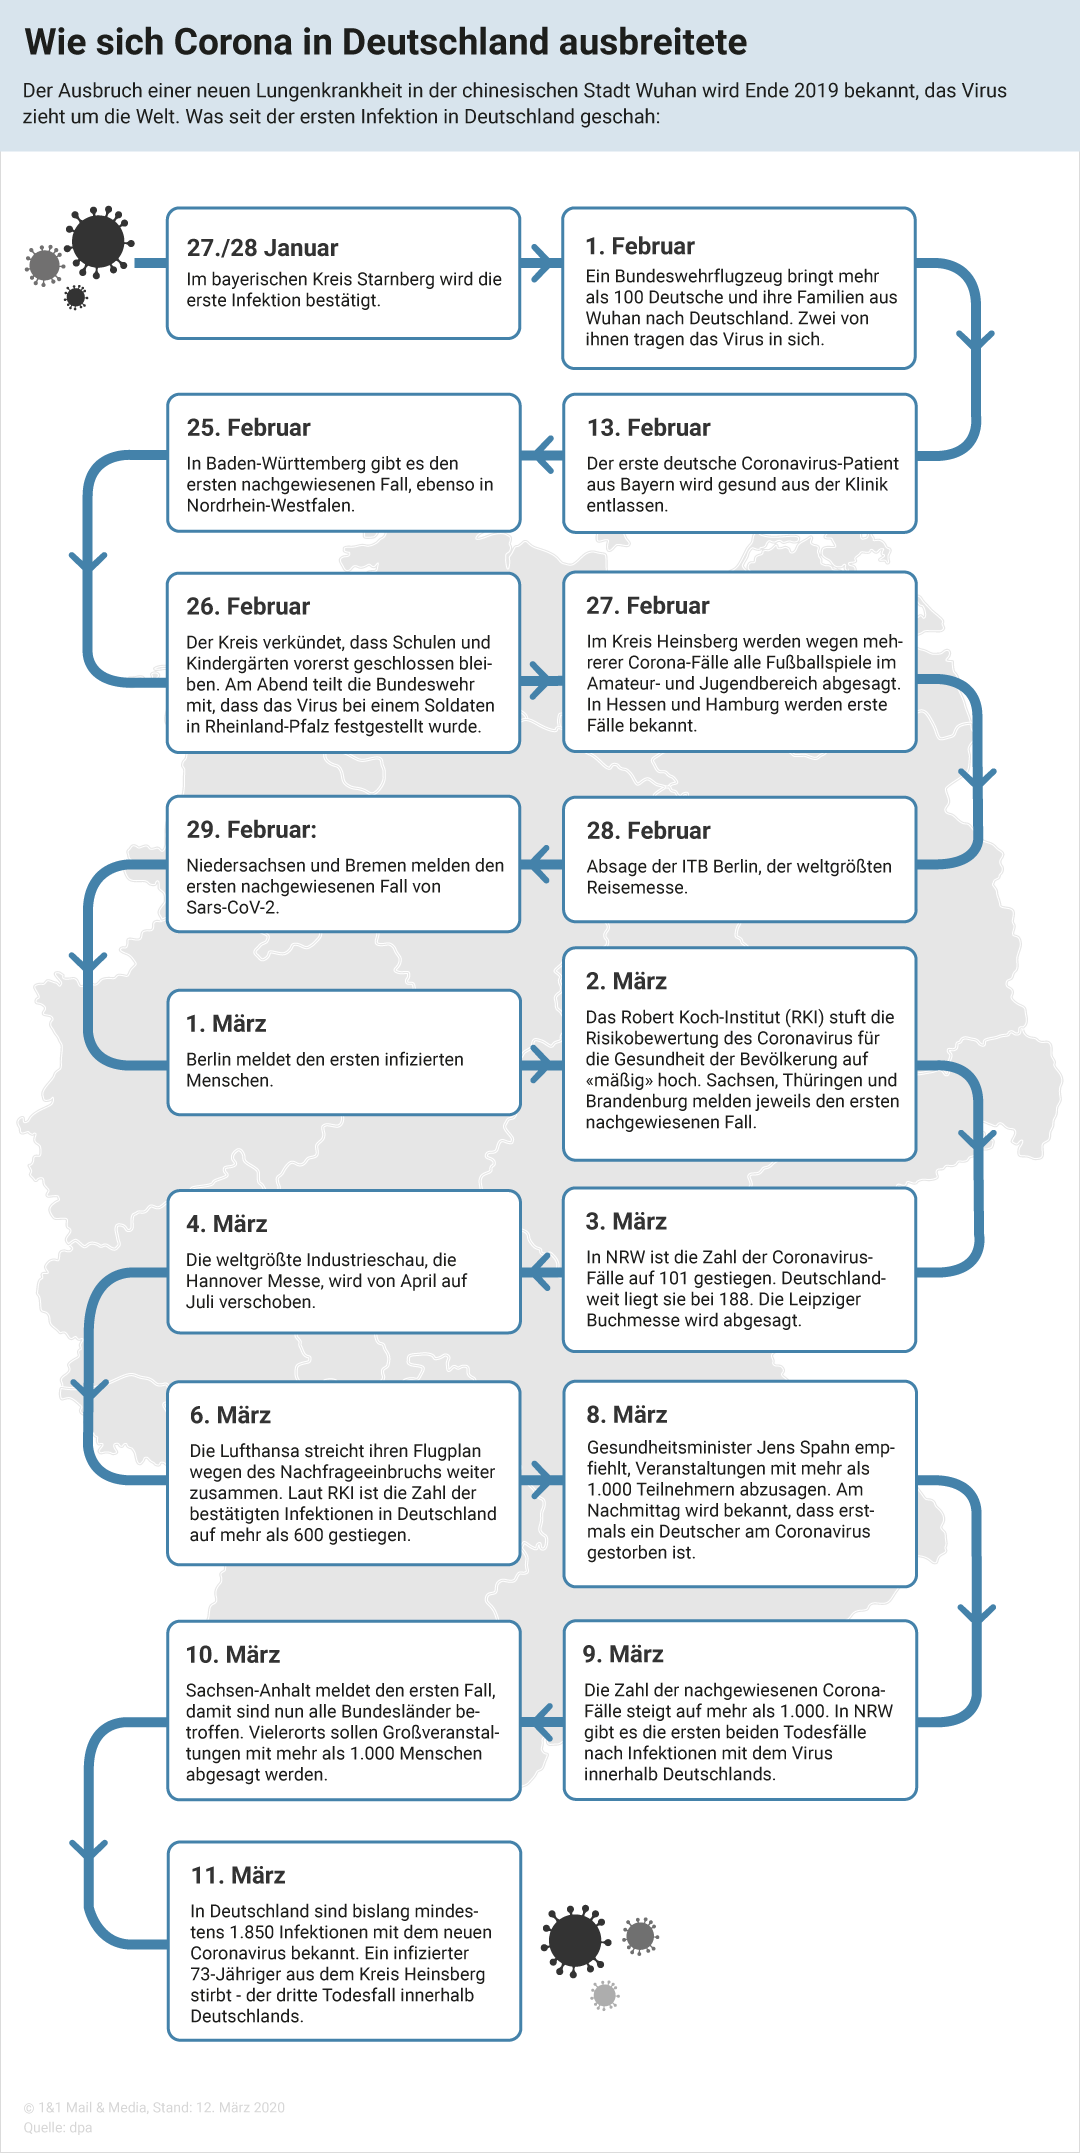 Bild zu Infografik: Ausbreitung Coronavirus in Deutschland